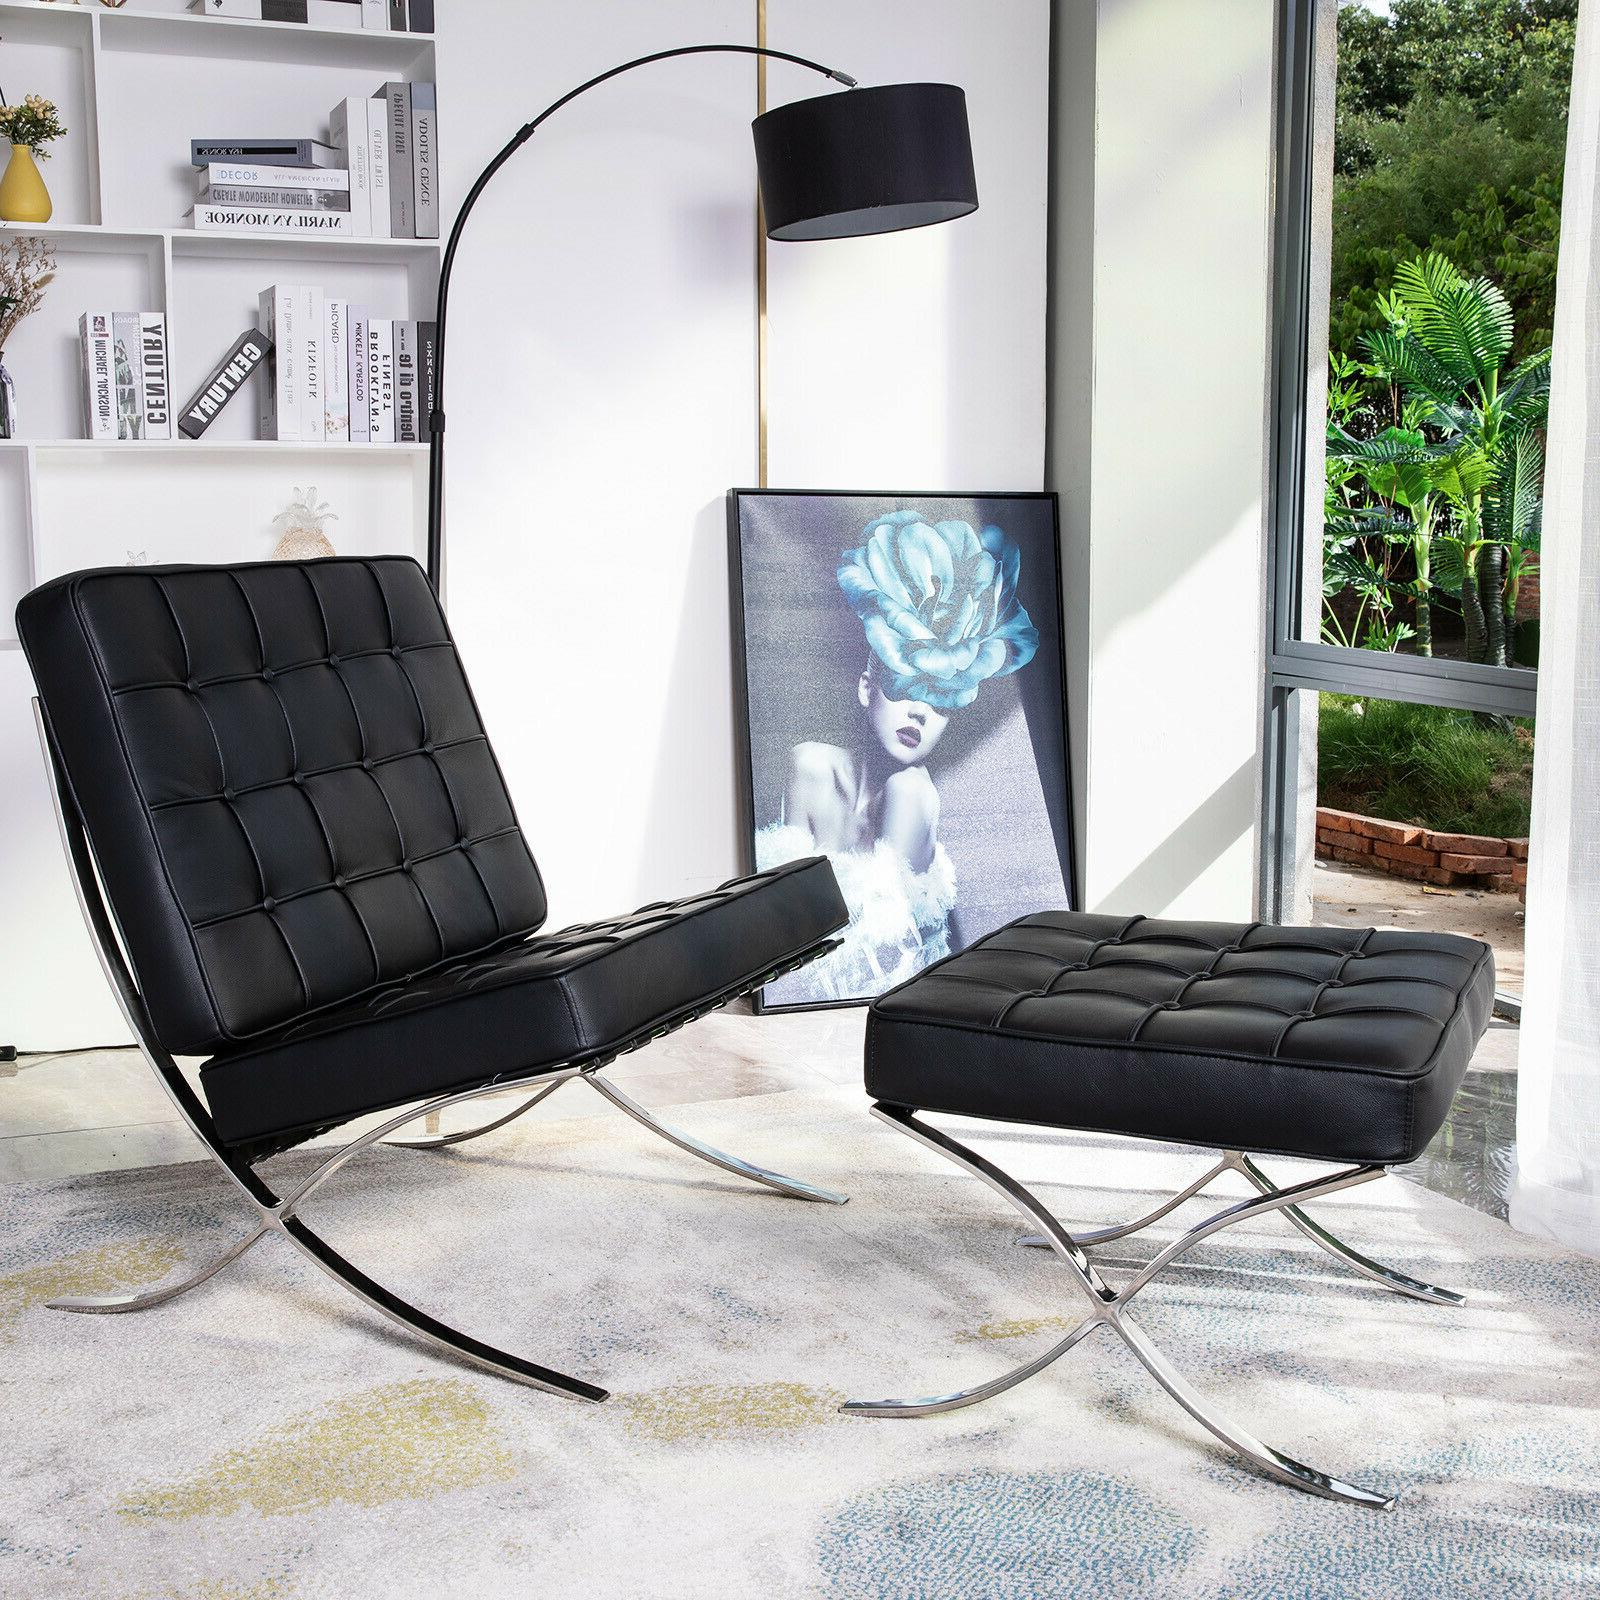 Atayal Barcelona Chair, Single Seat, Sofa Chair,